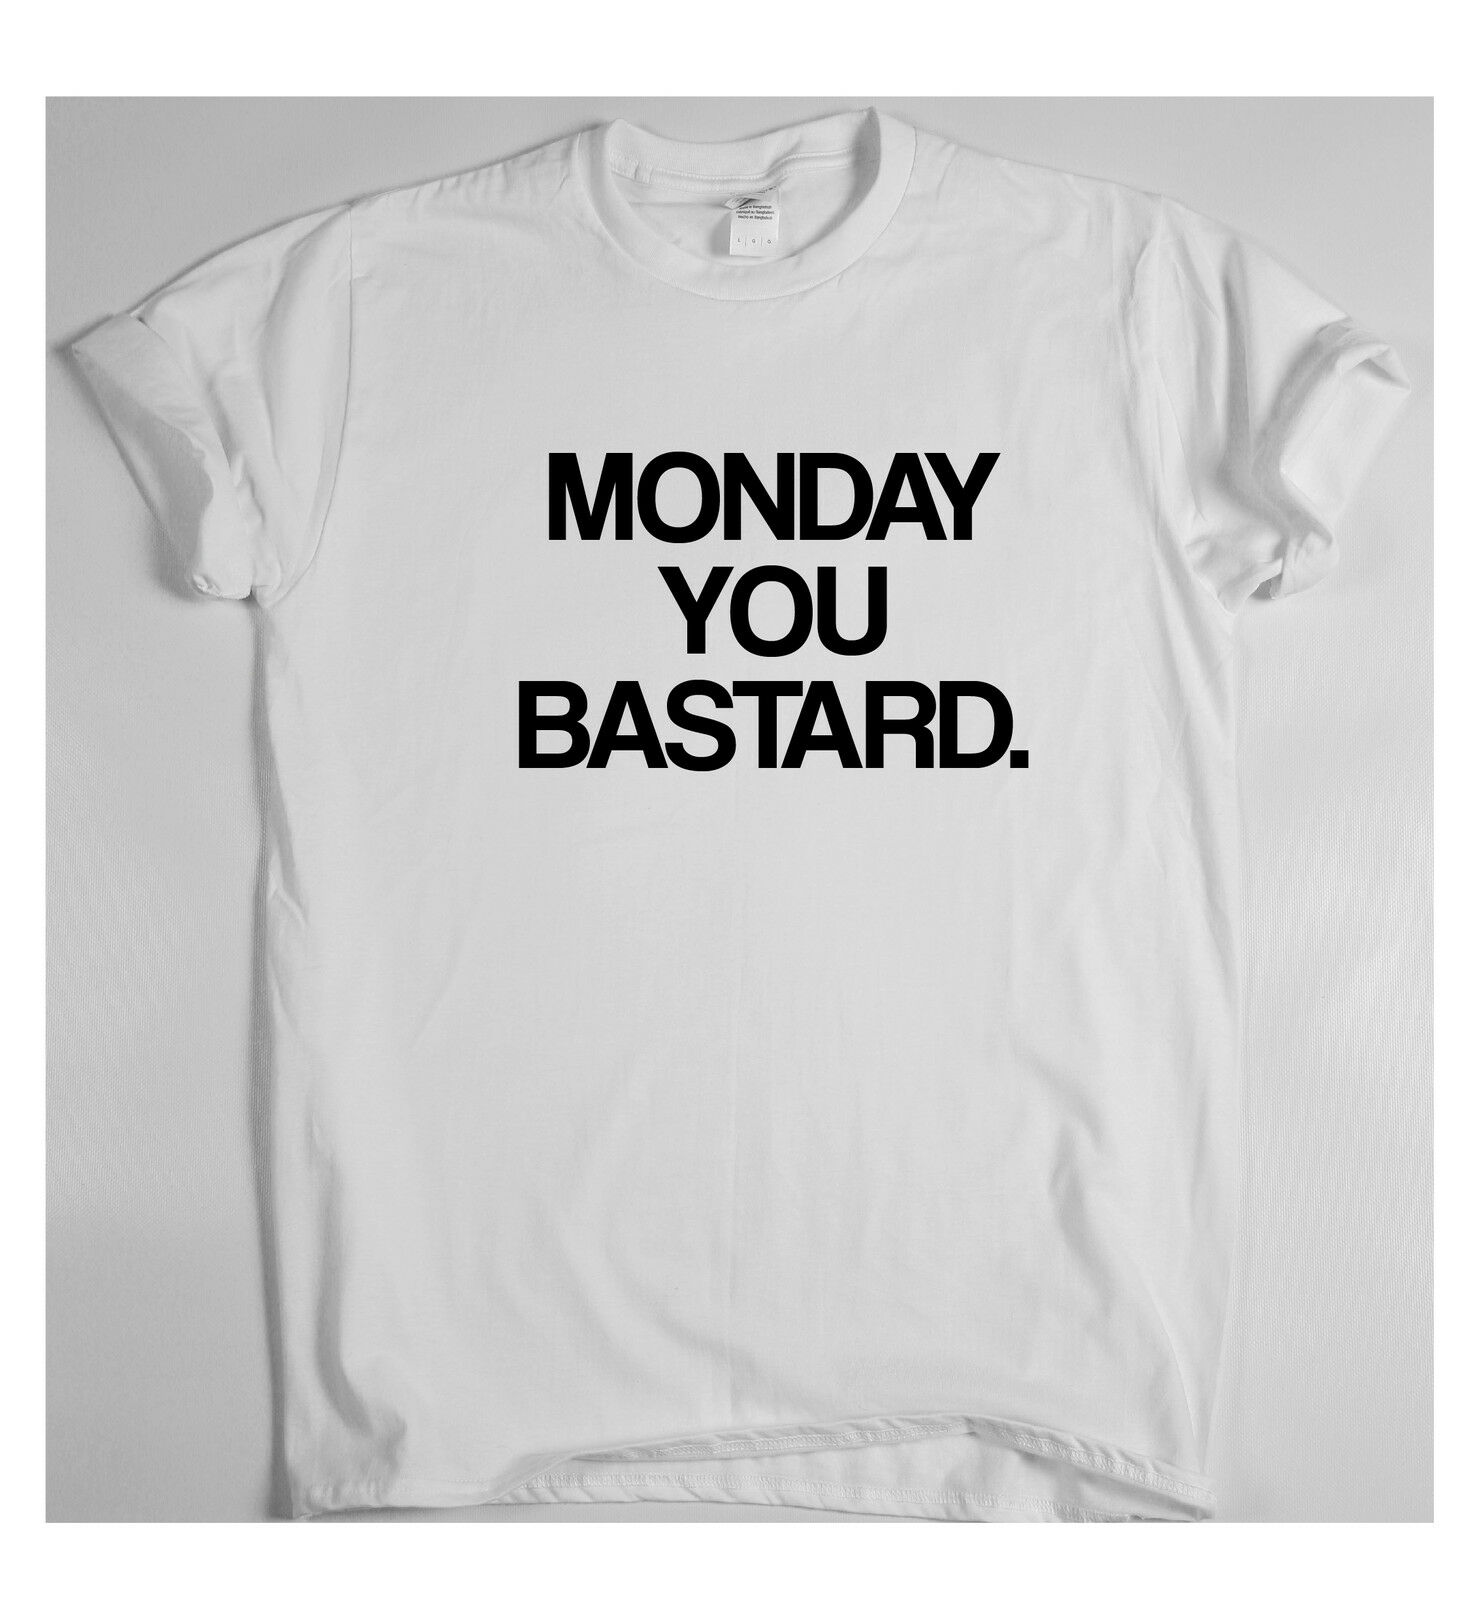 Hari Senin Bajingan X T Shirt Lucu Slogan Humor Lelucon